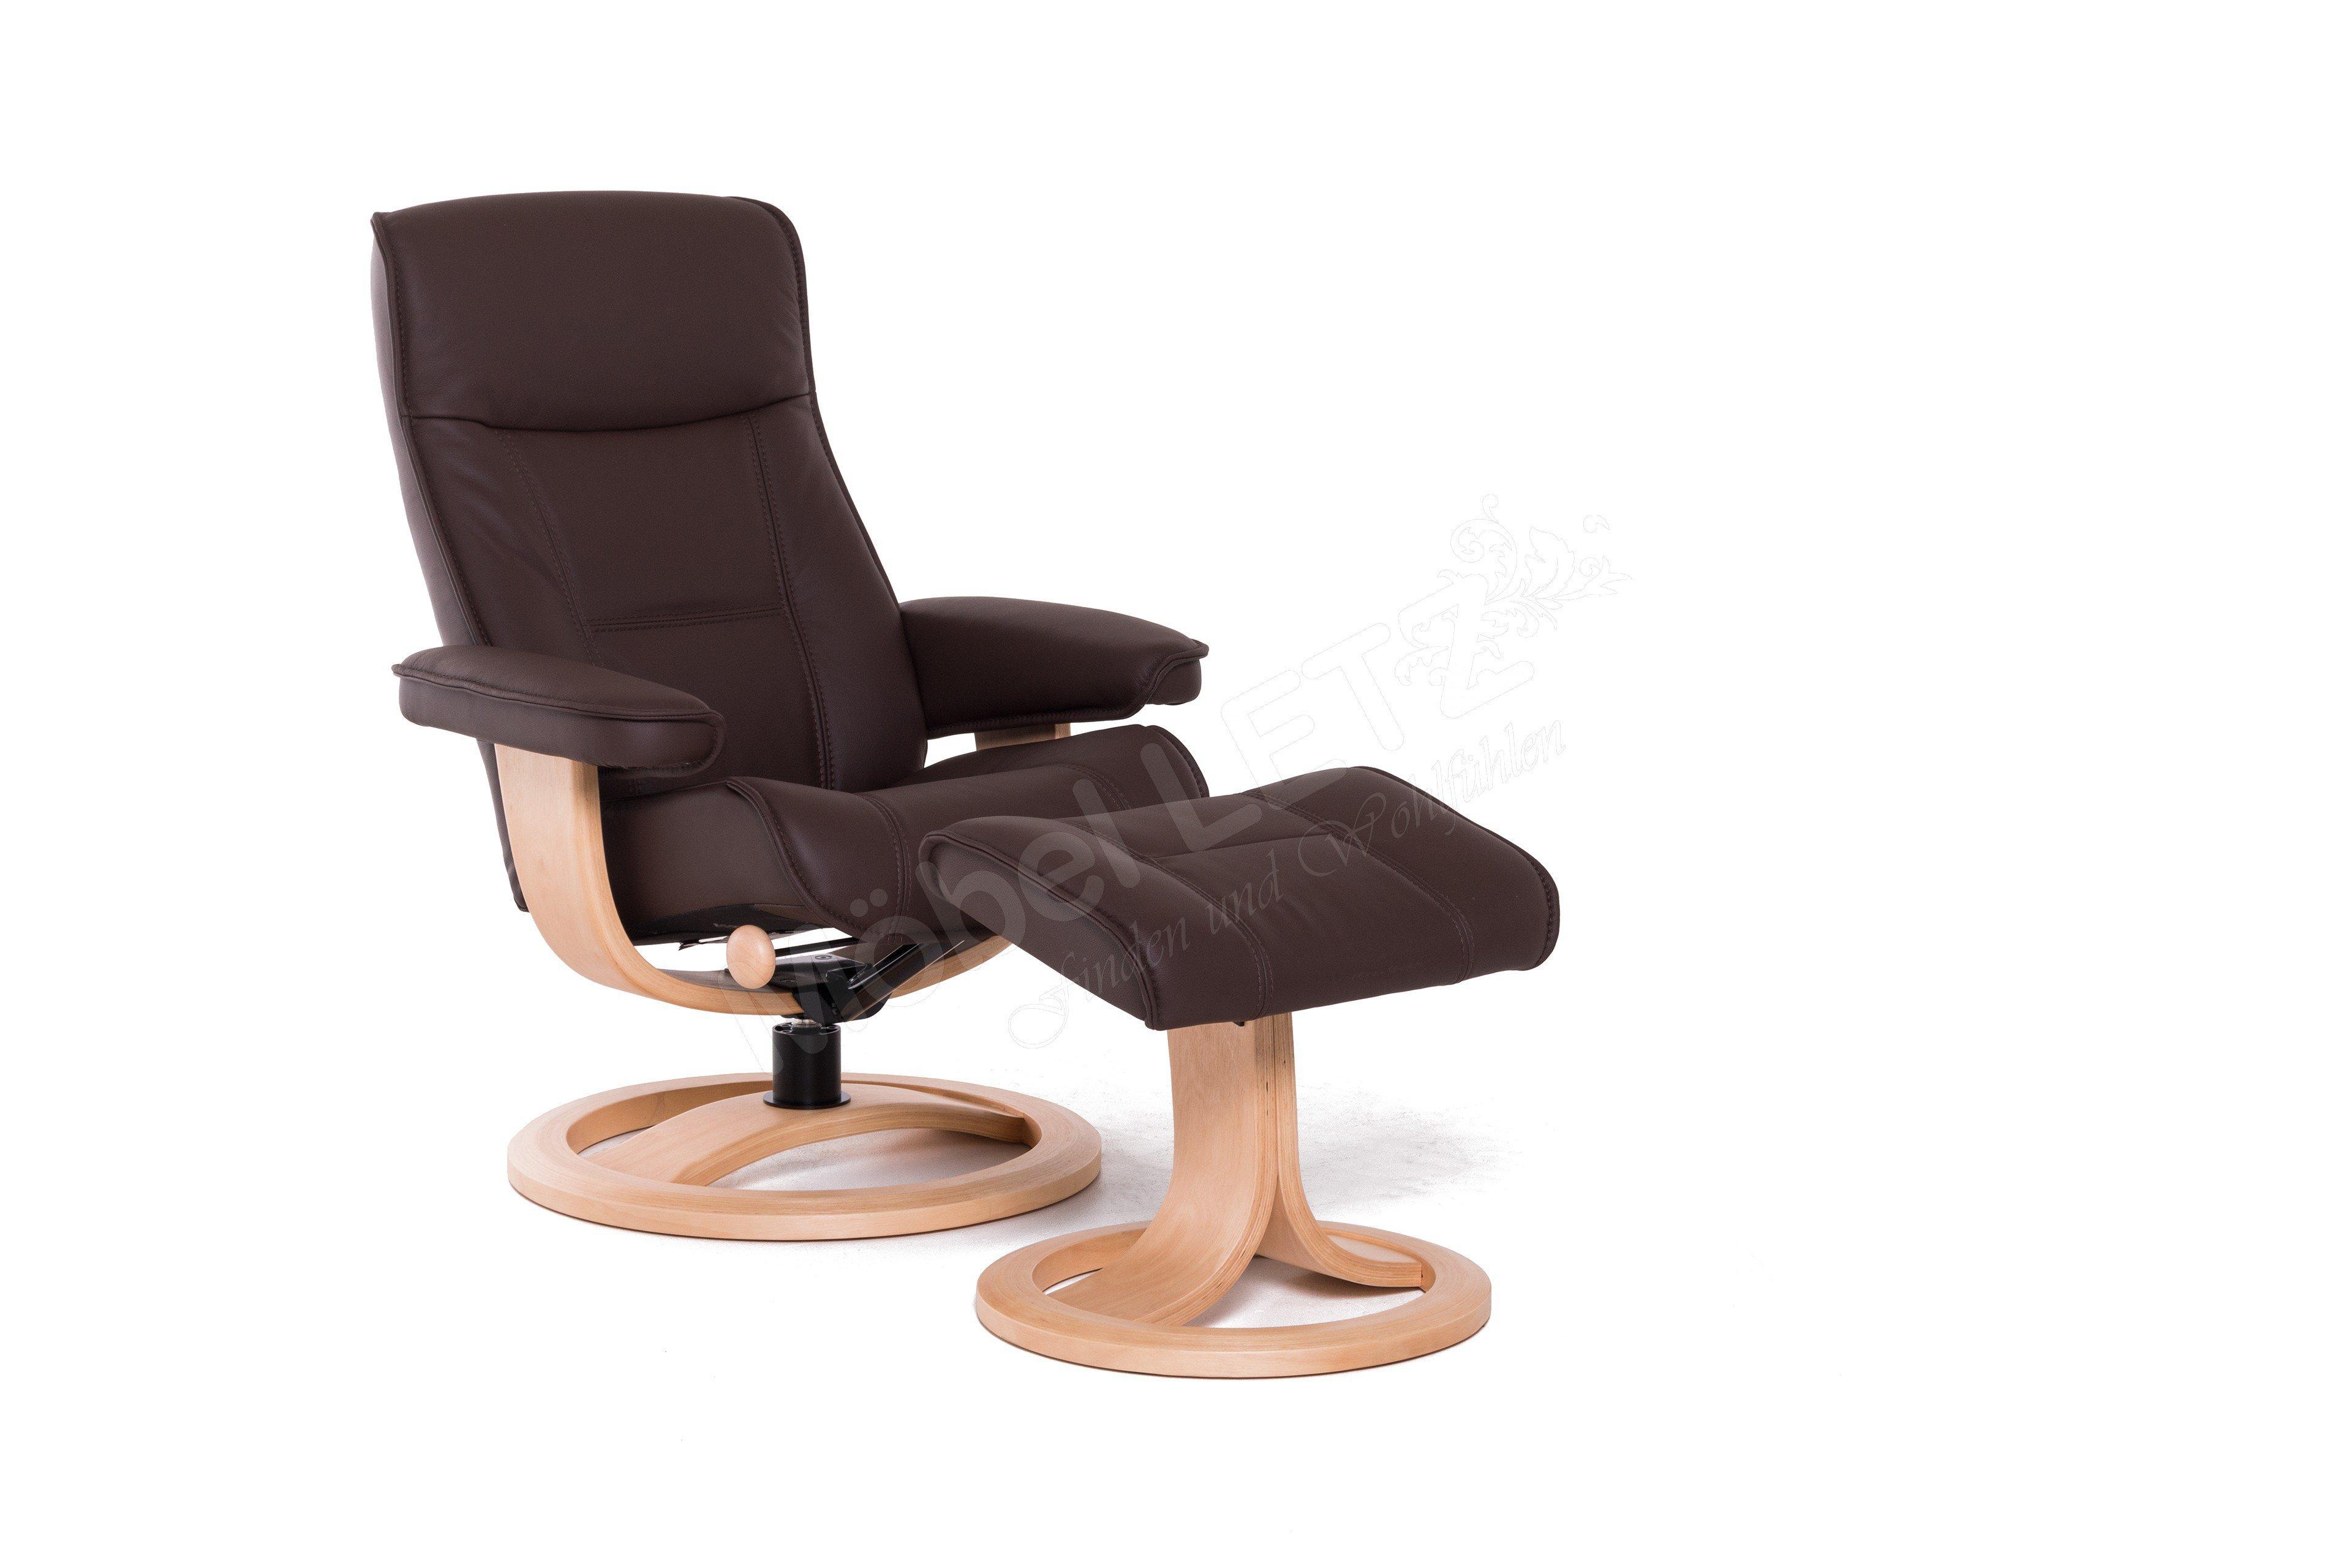 img comfort viking relaxsessel braun m bel letz ihr online shop. Black Bedroom Furniture Sets. Home Design Ideas